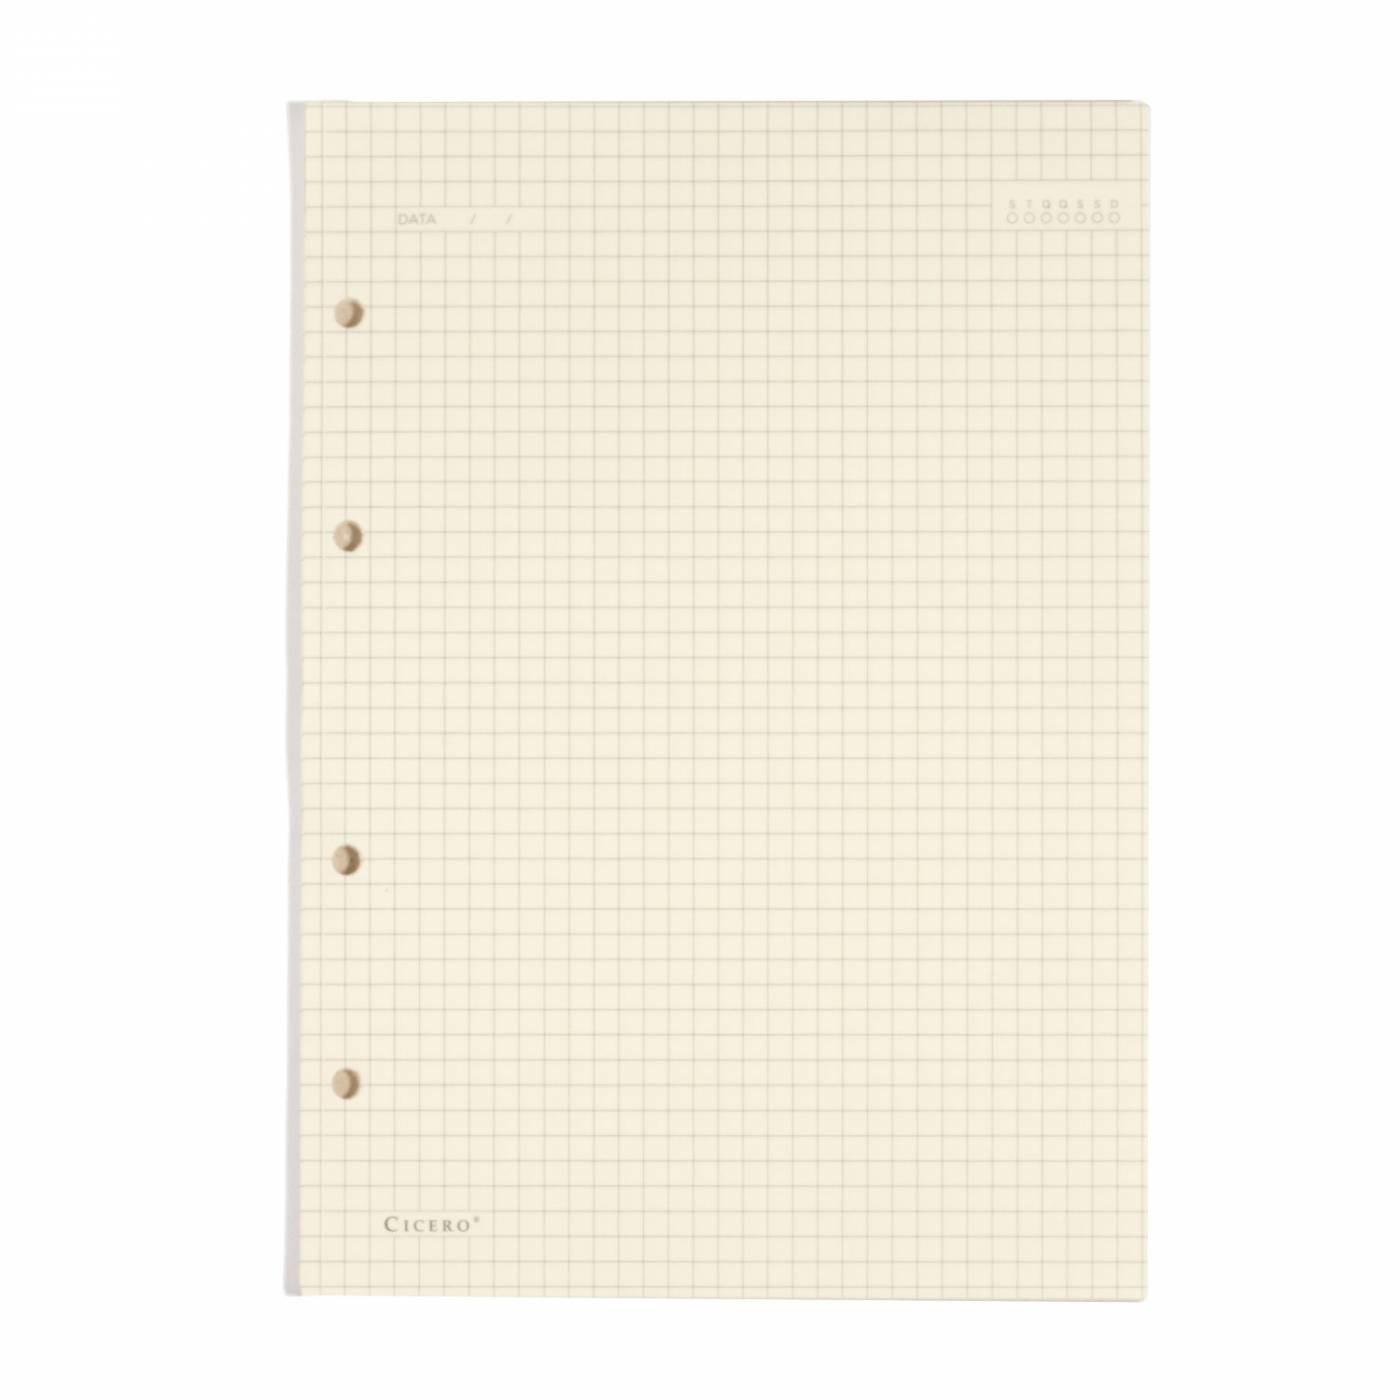 Refil Caderno Fichario 17x24cm Quadriculado Papel Polen